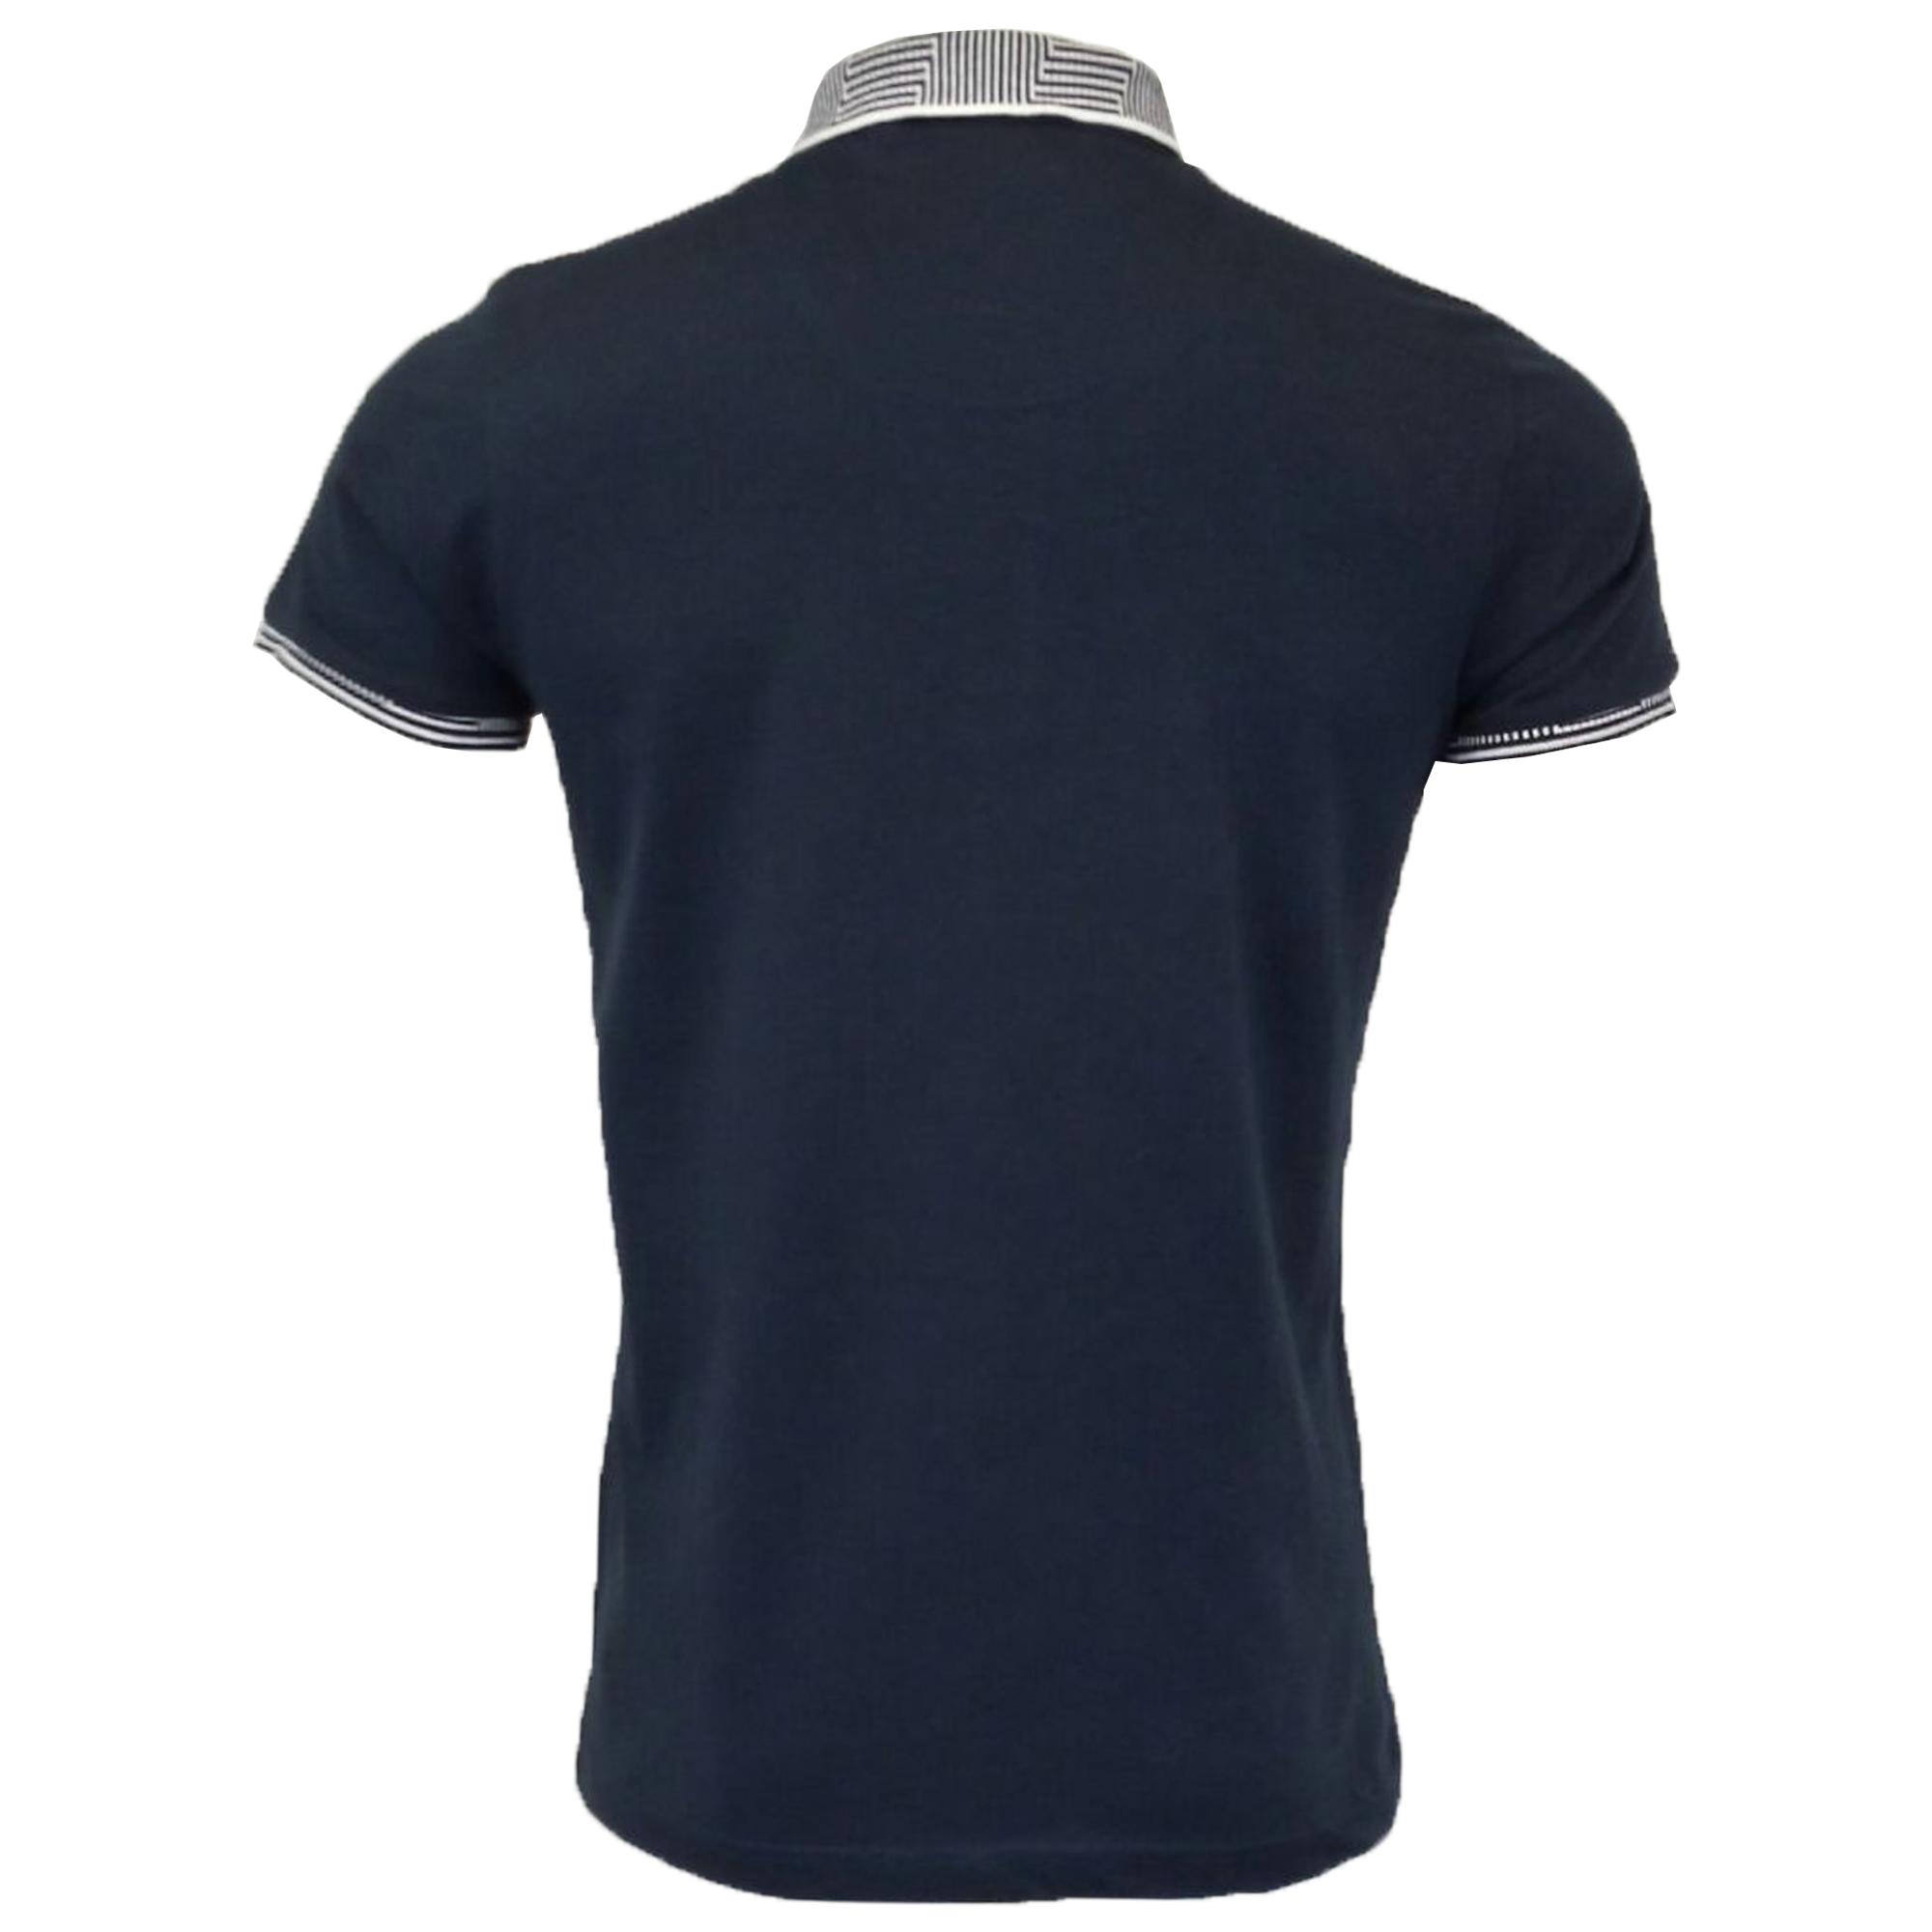 Mens-Polo-T-Shirt-Brave-Soul-Short-Sleeved-Cotton-GLOVER-Collared-KHALIFA-Summer thumbnail 3